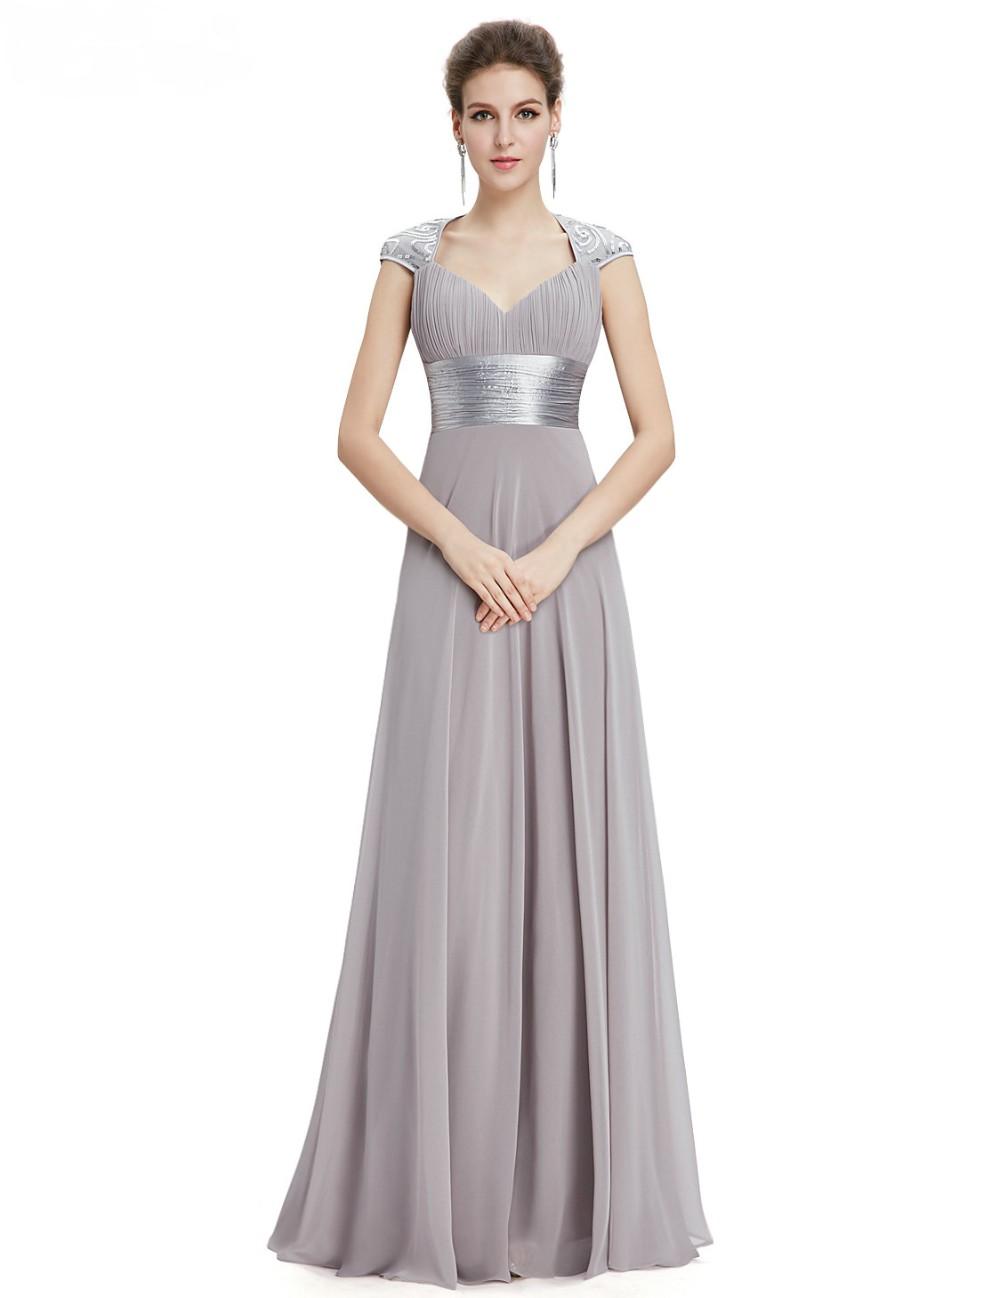 Vneck sequins chiffon ruffles empire line evening bridesmaid dress